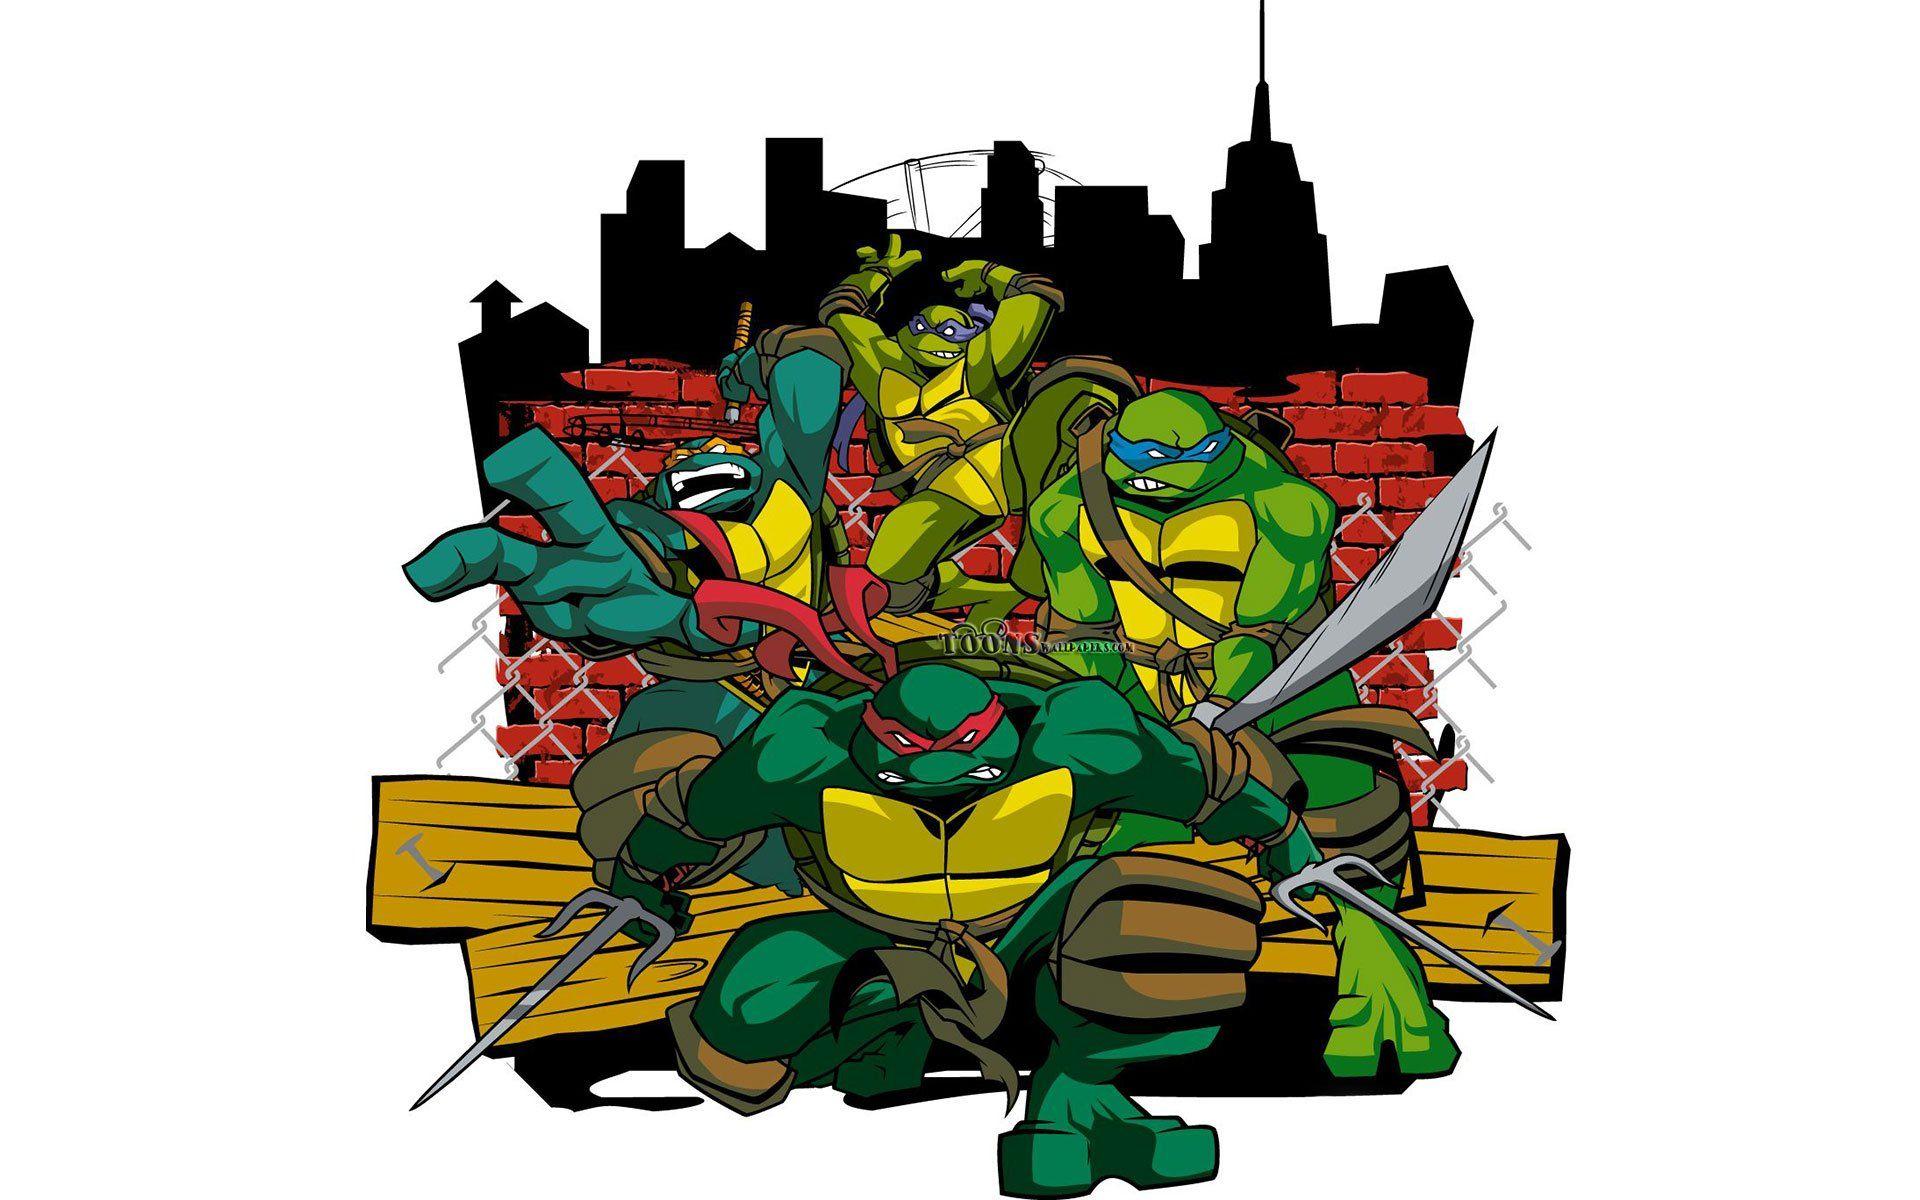 Teenage mutant ninja turtles hd wallpapers backgrounds hd teenage mutant ninja turtles hd wallpapers backgrounds voltagebd Images